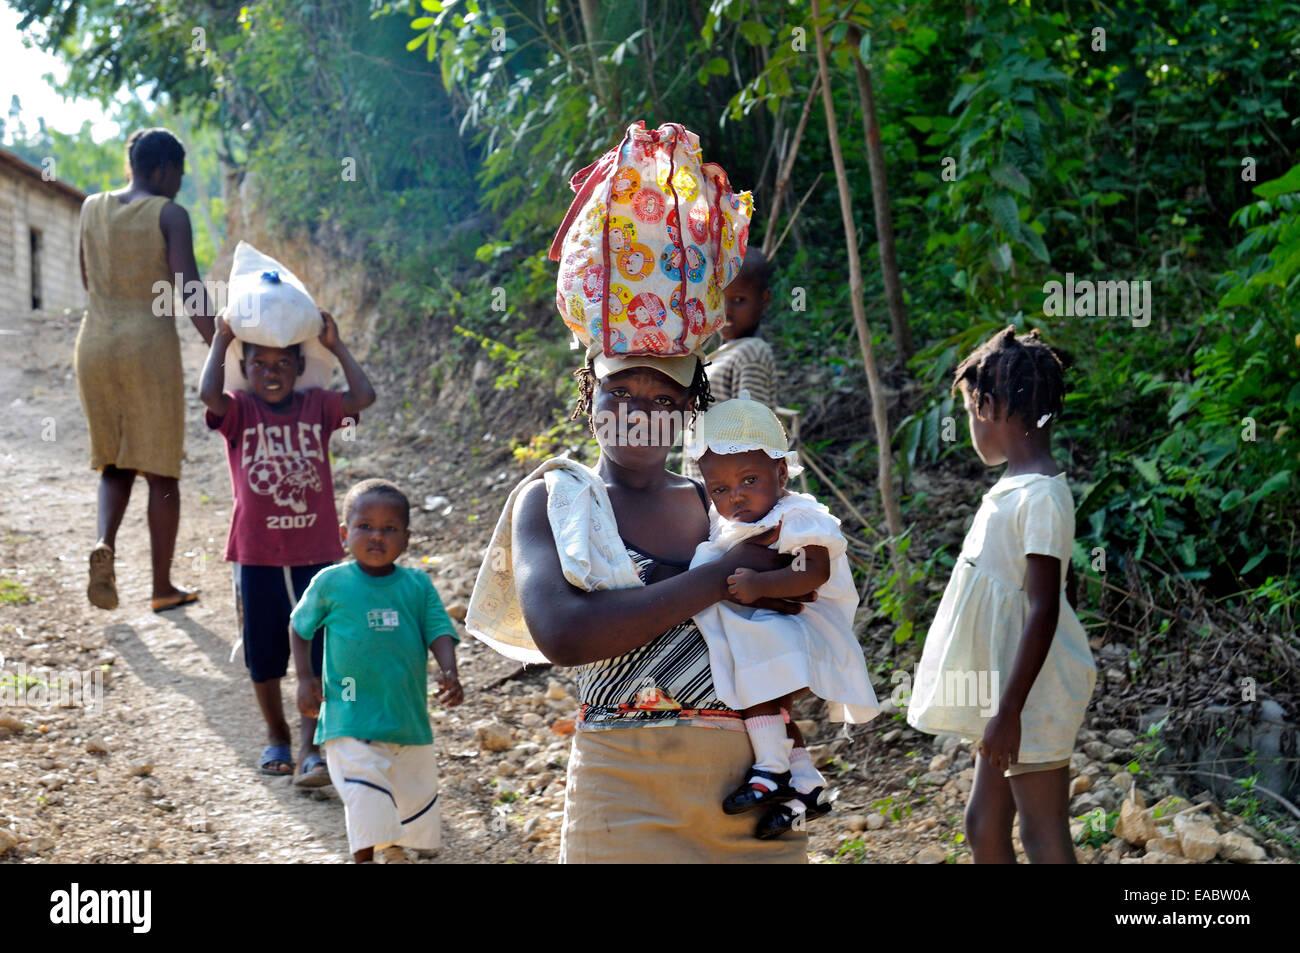 Haiti Petit Goave Familiy walking on foot path - Stock Image